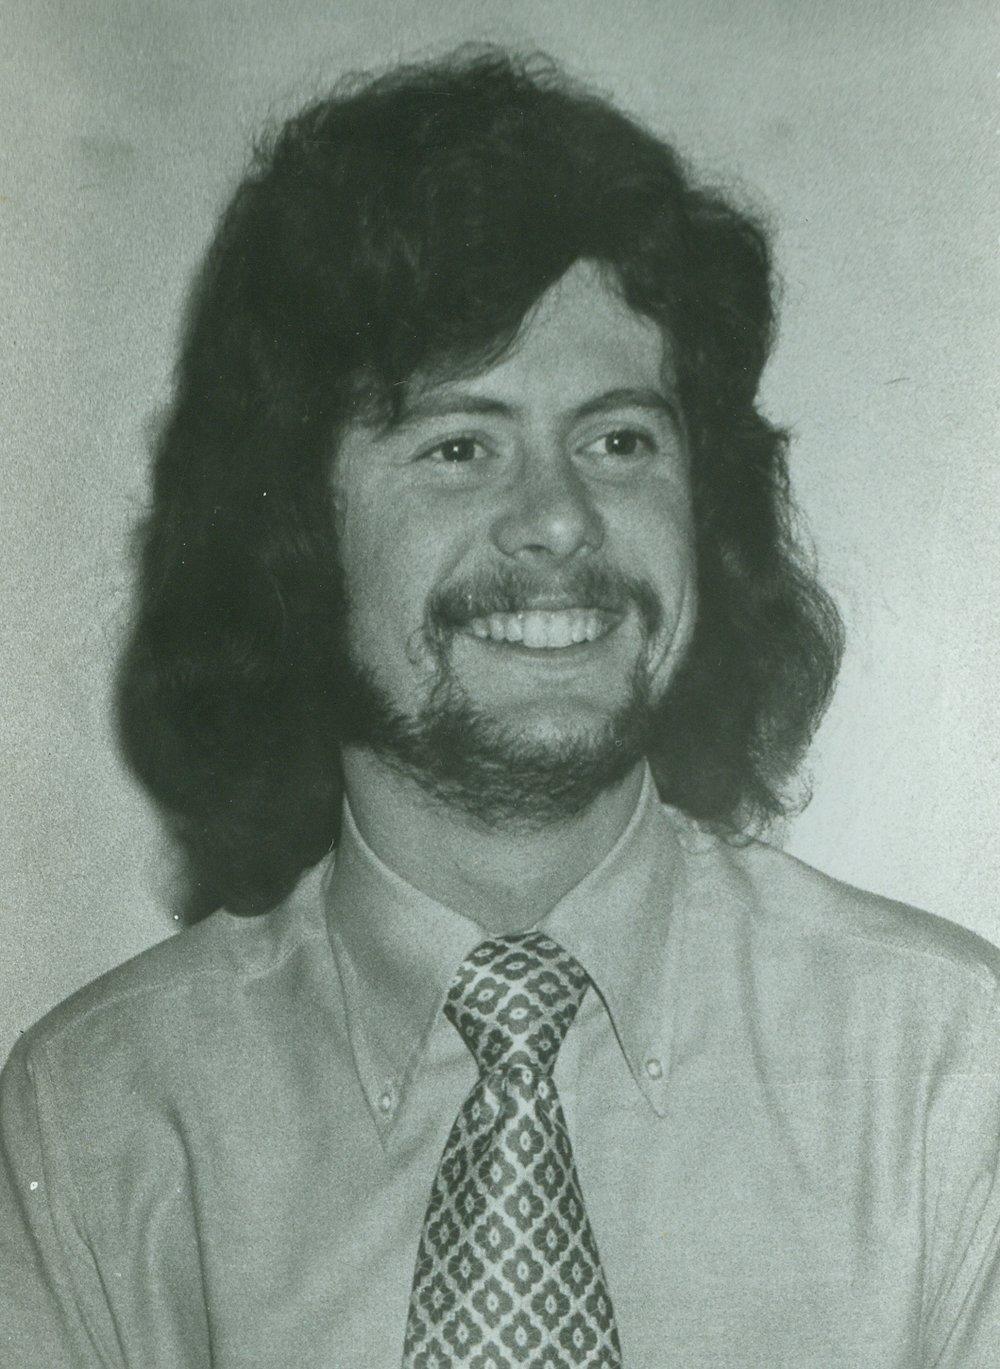 Jeff Rothermel